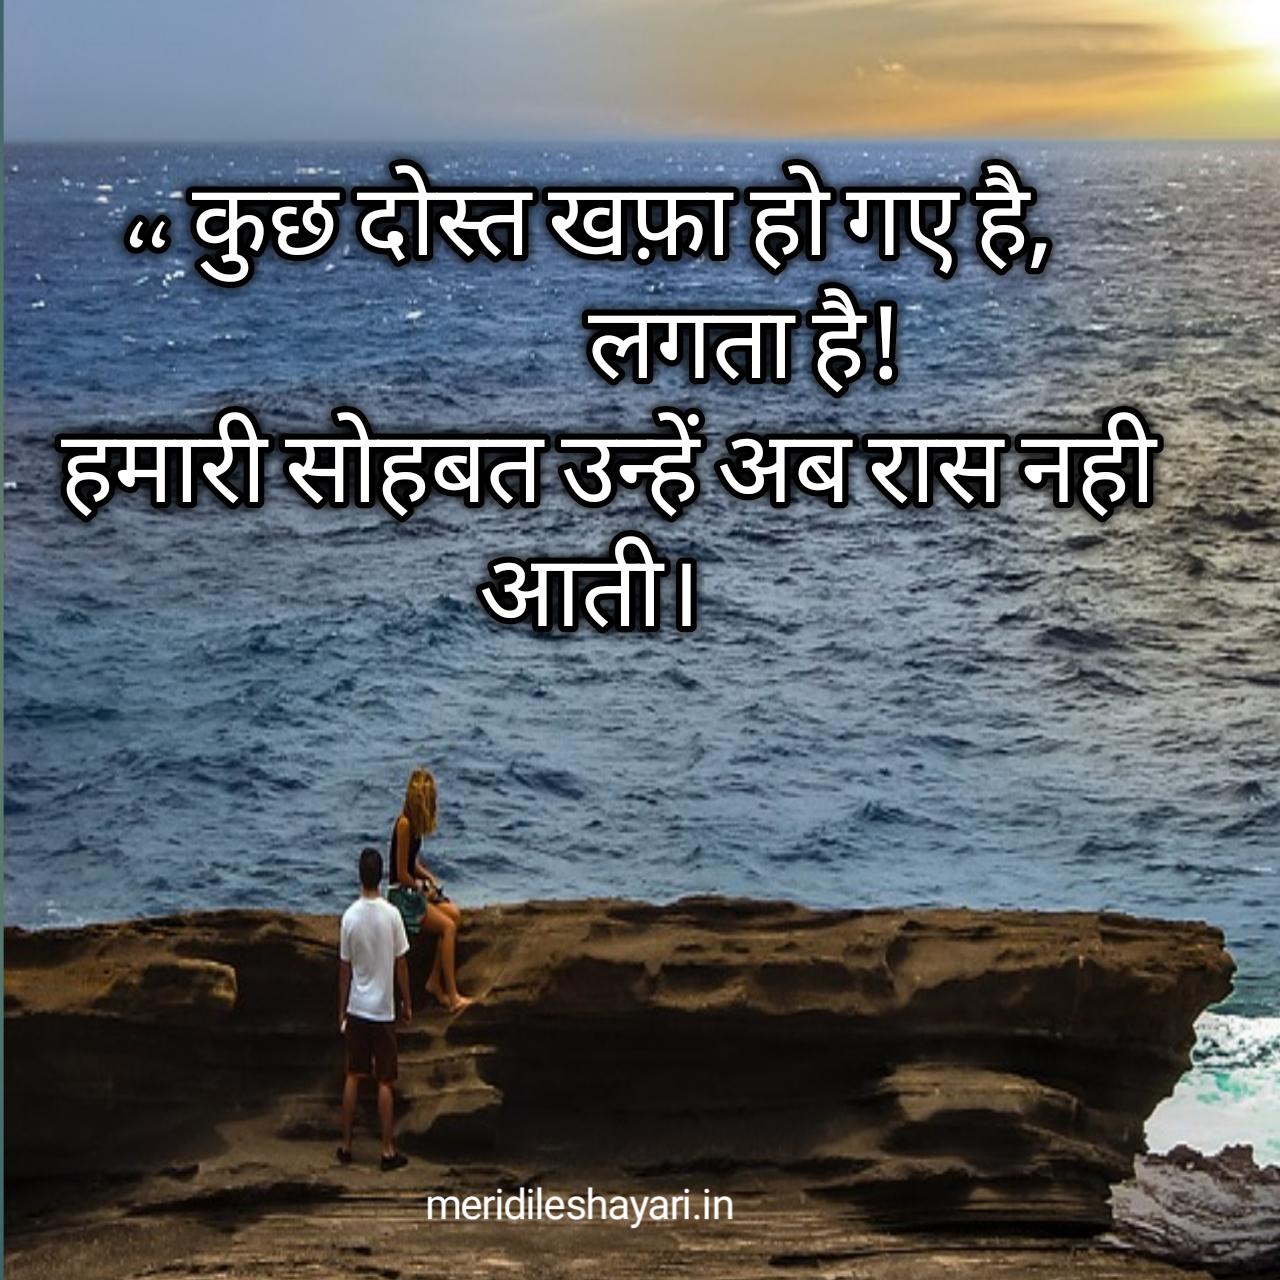 Dosti shayari,dosti shayari hindi,dosti shayari in hindi,dosti shayari best,dosti shayari image,dosti shayari in english,dosti shayari funny,meri dil e shayari,photo dosti shayari in hindi